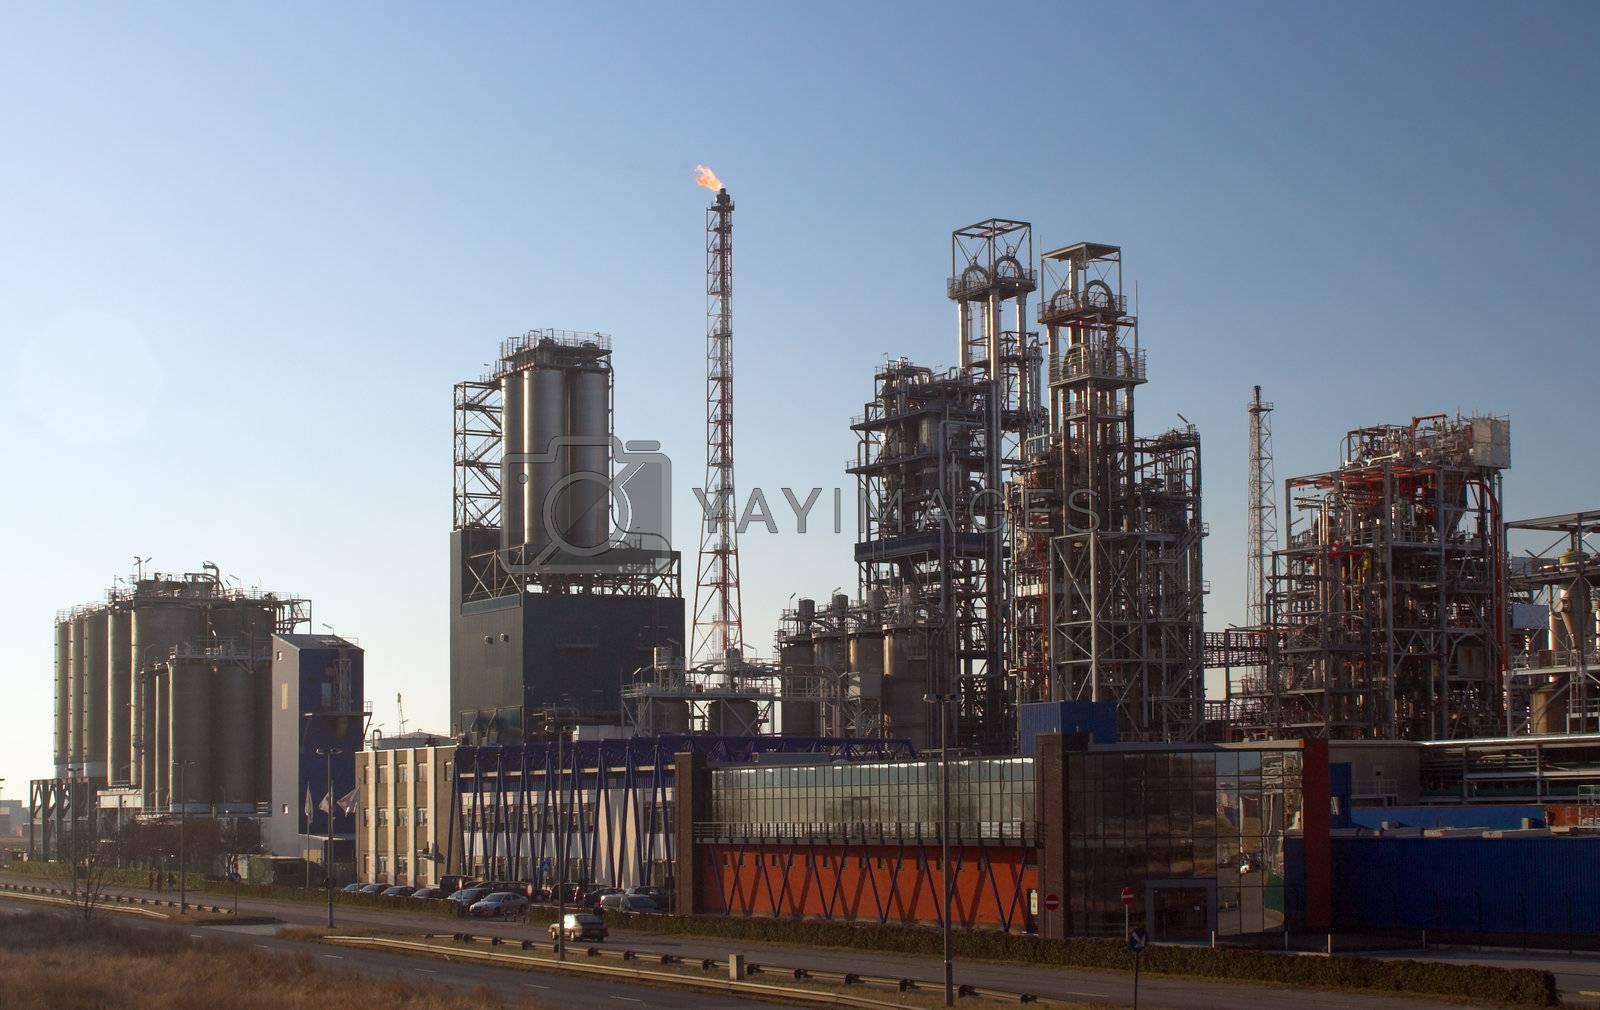 Oil refinery before sunset - Antwerp port